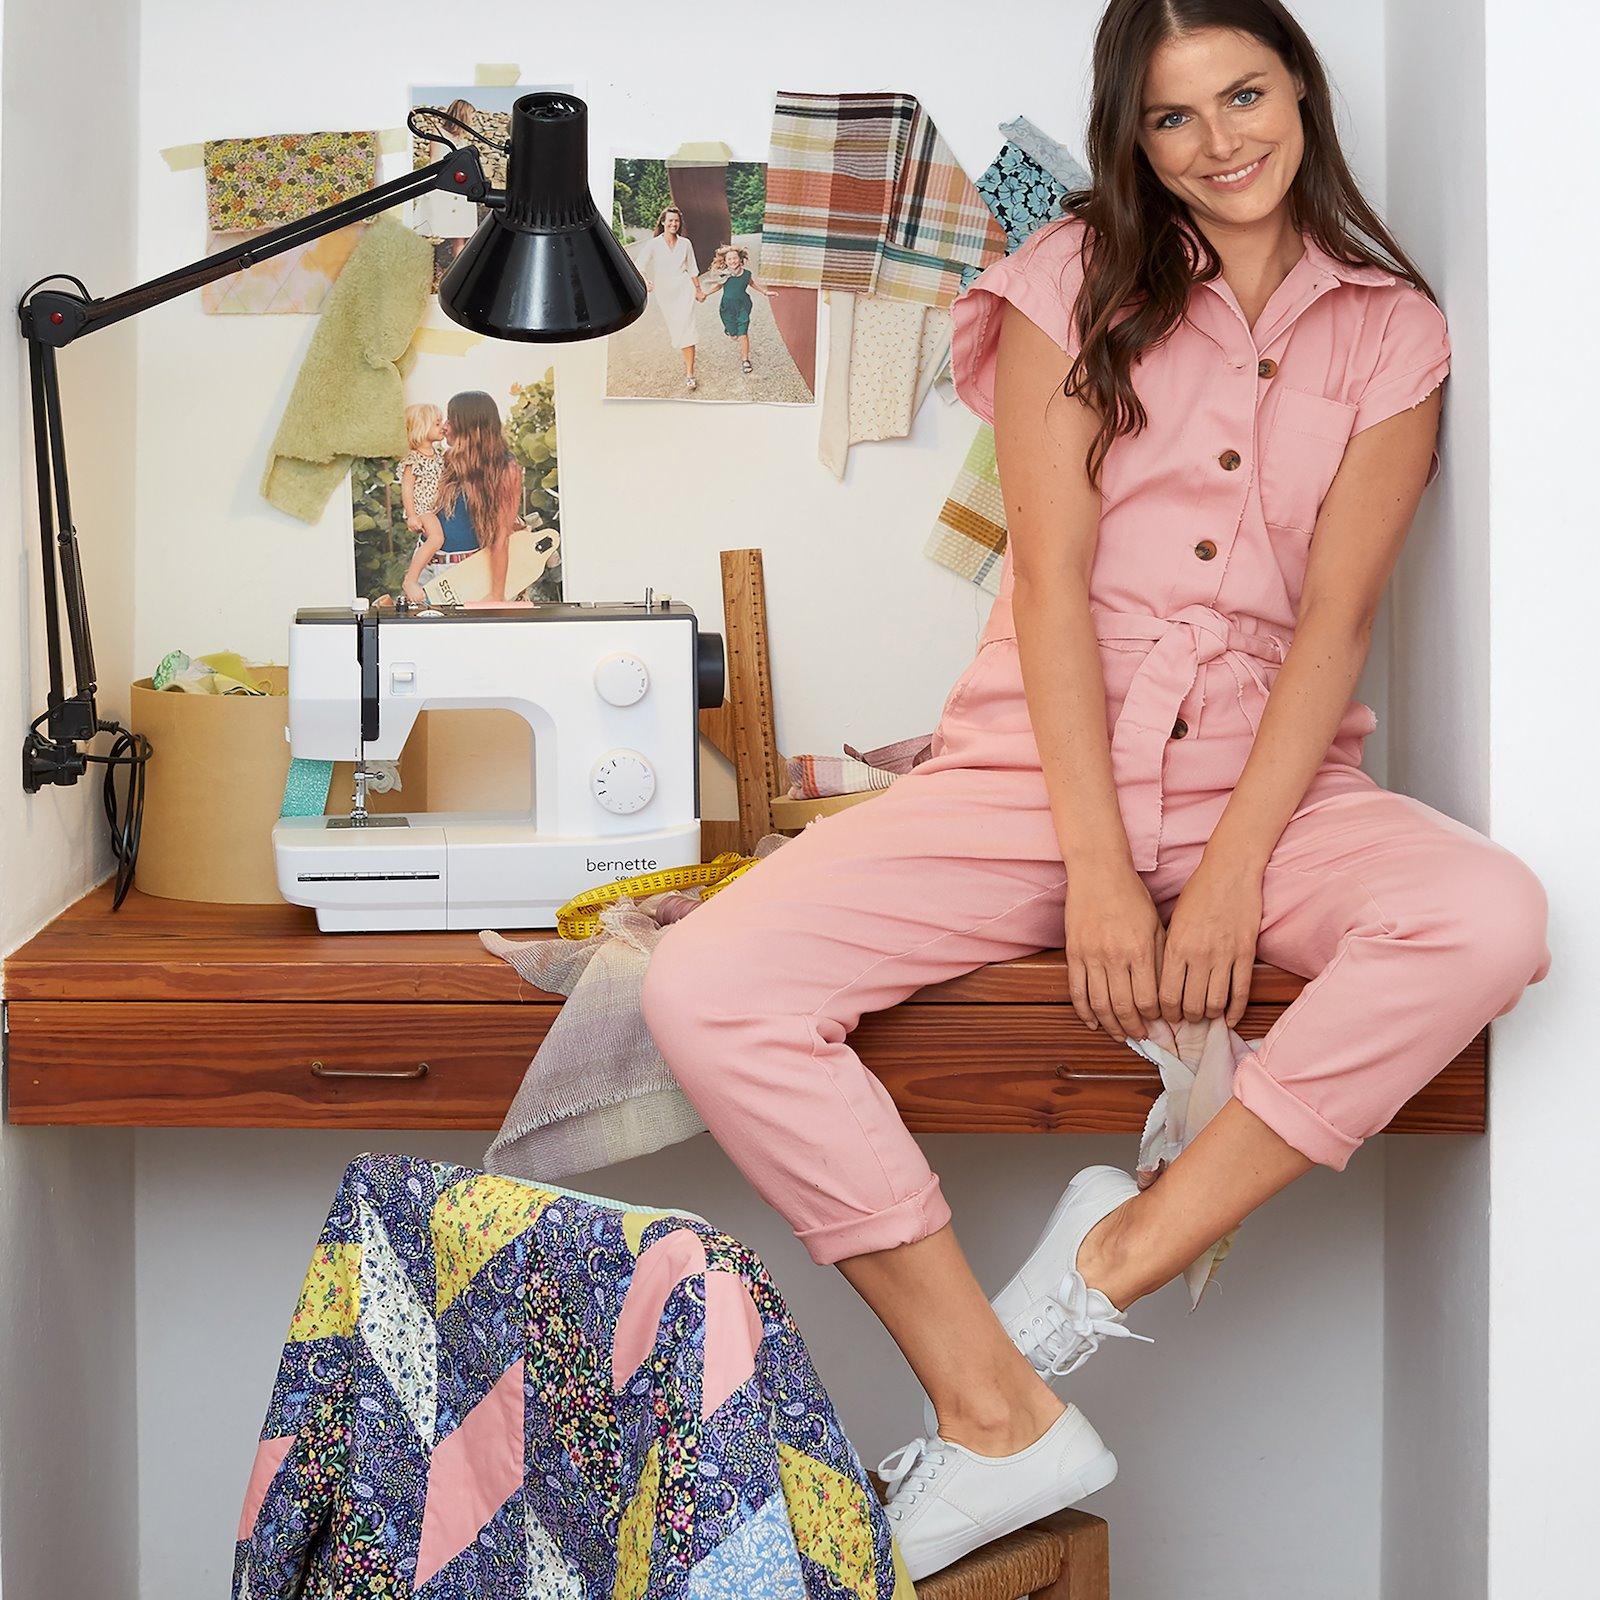 Luxury cotton dusty pink 852362_852359_852366_4358_4201_4357_64108_bundle